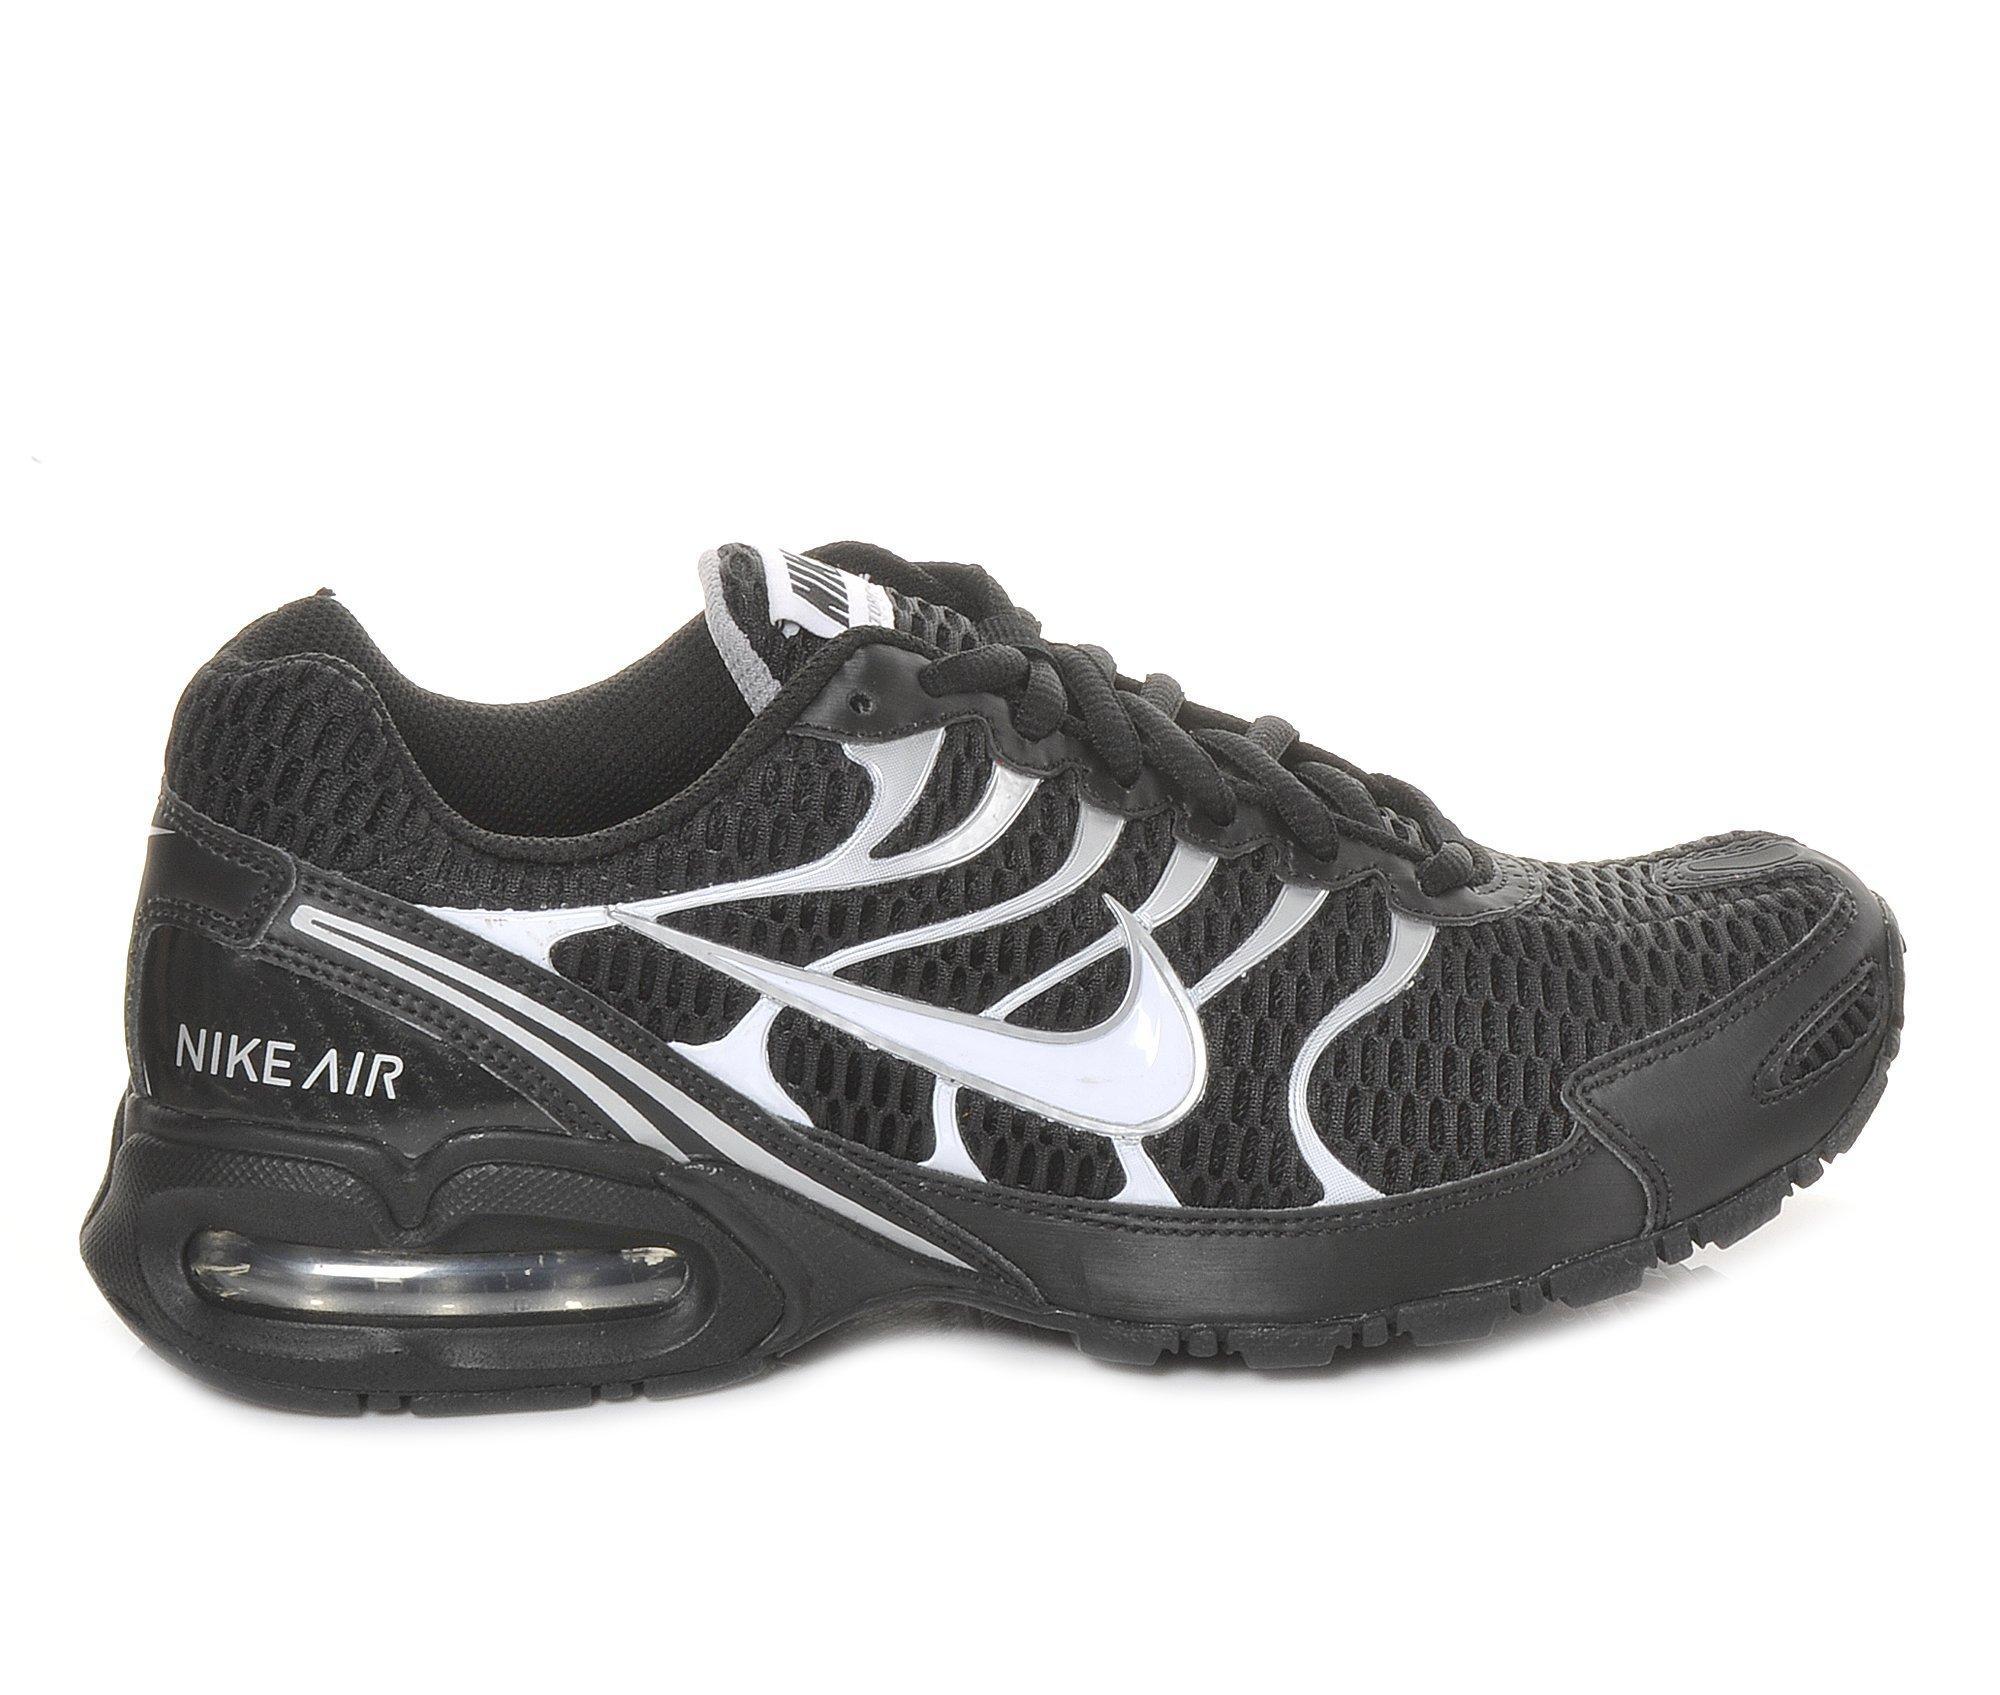 Nike air max torch 4 running shoe - Nike Air Max Torch 4 Running Shoe 12